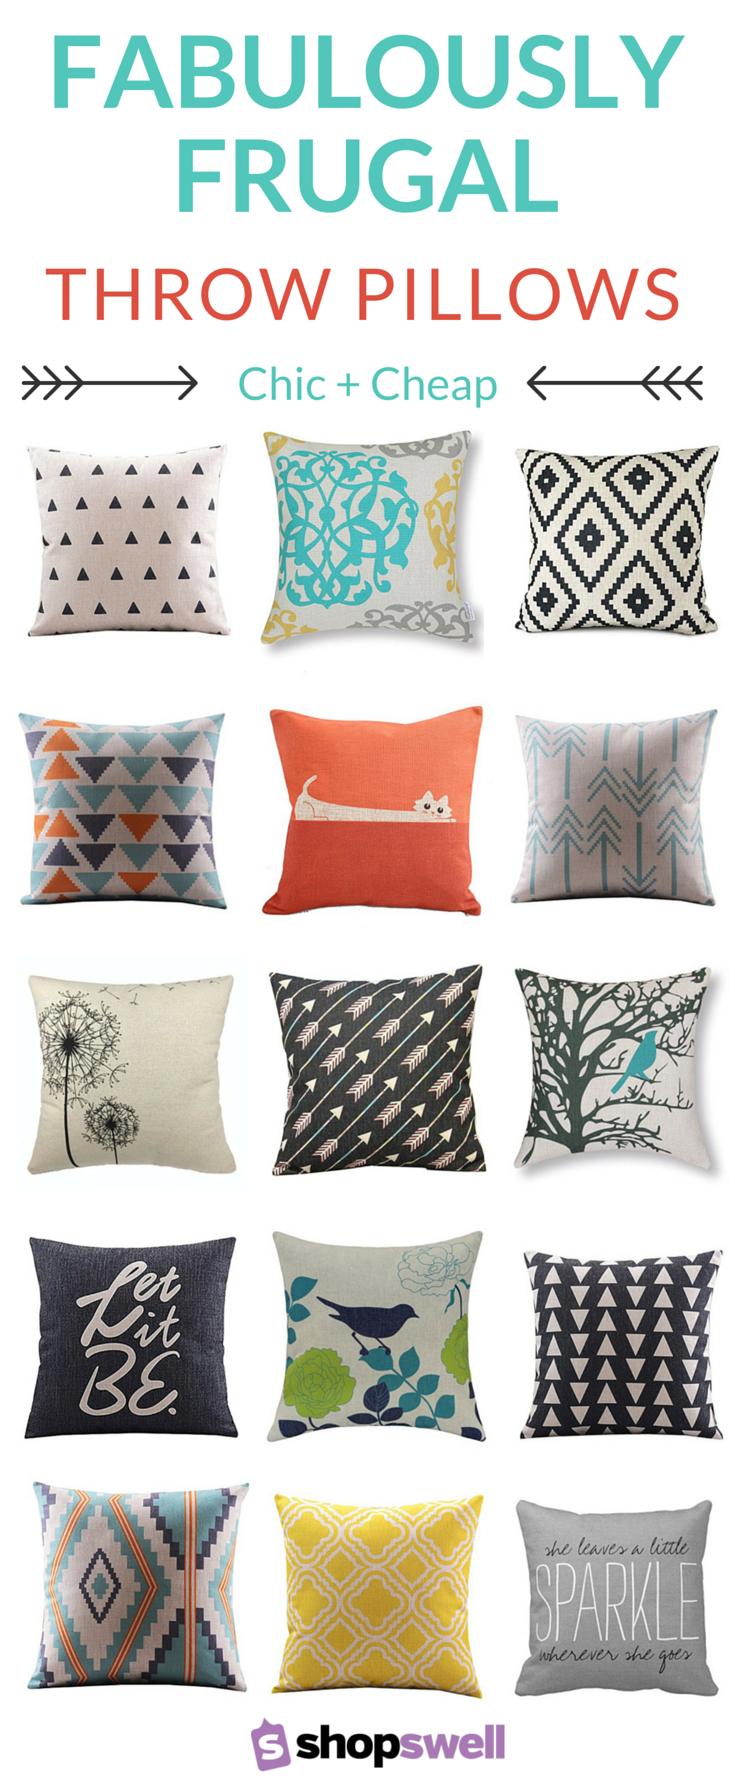 Chic fabulous and cheap throw pillows shiloh farms rd